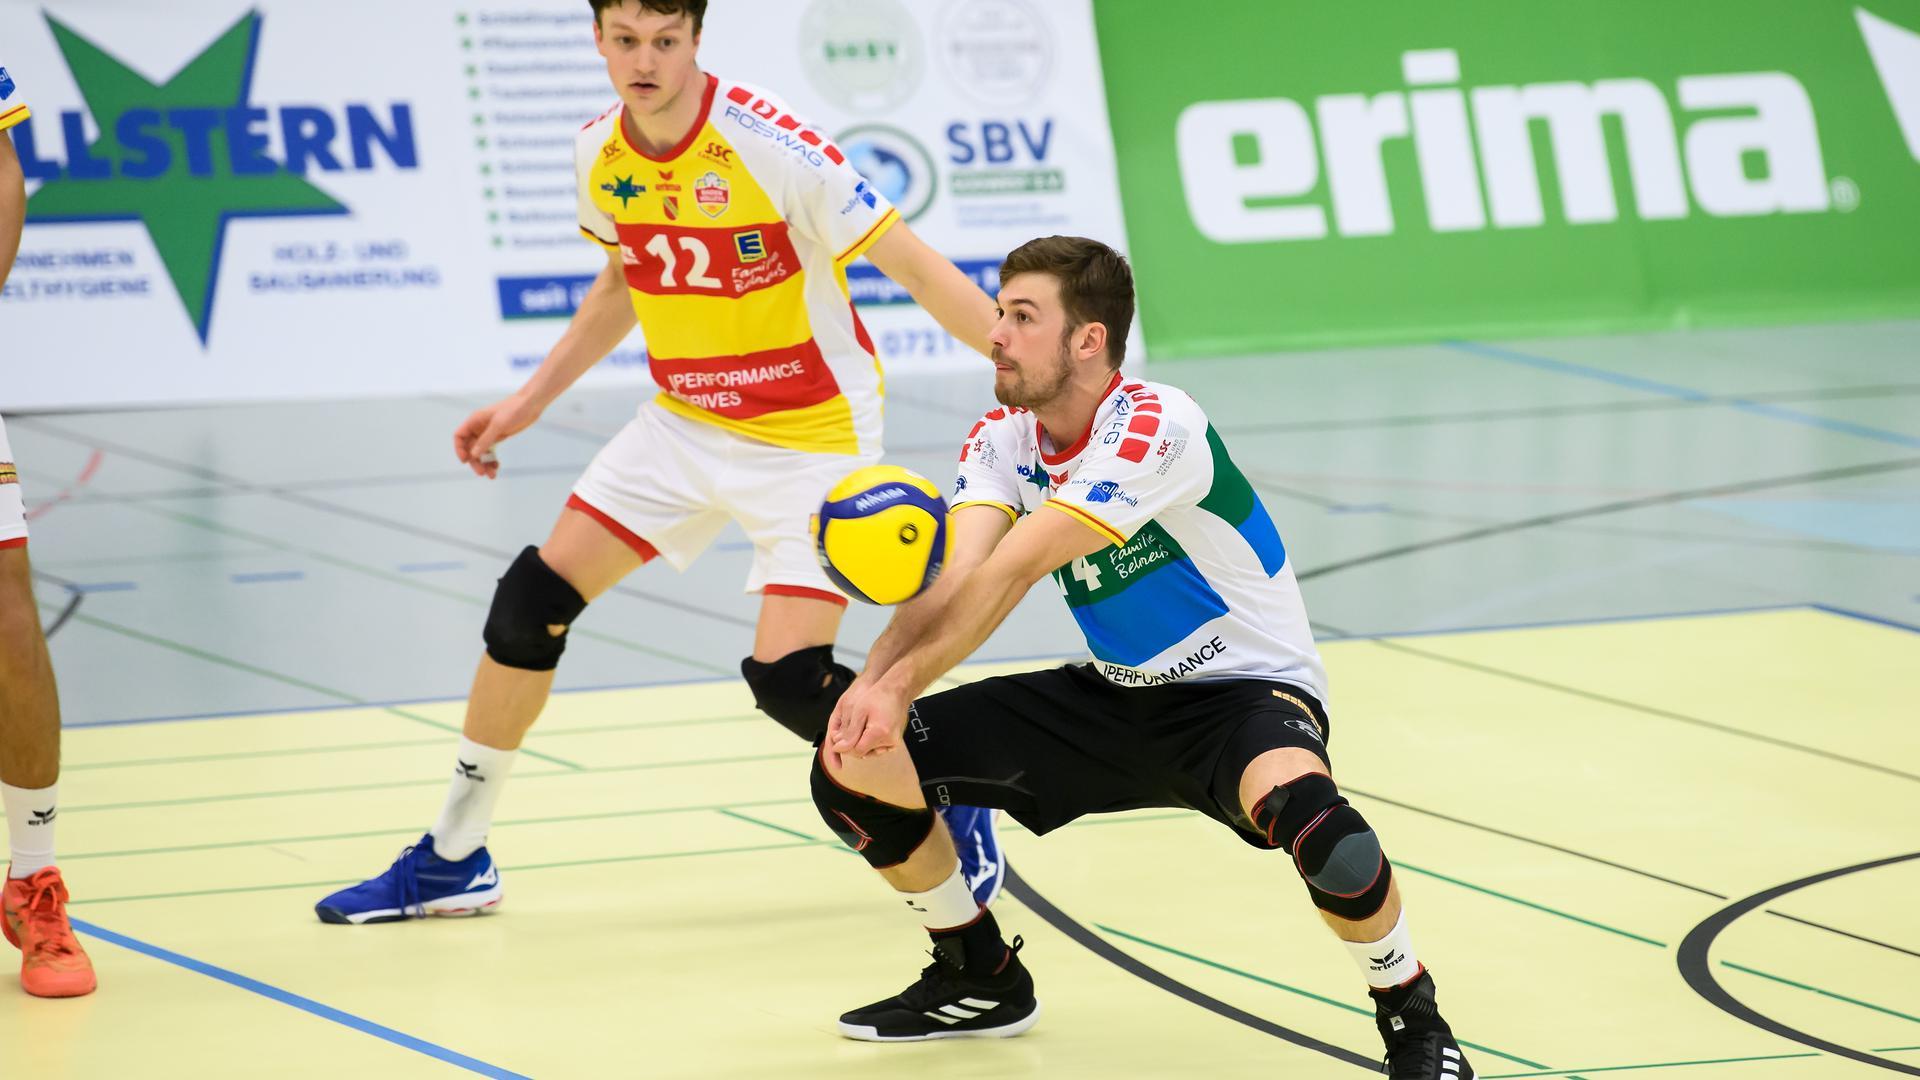 Benjamin Dollhofer (SSC) am Ball.  GES/ Volleyball/ 2. Bundesliga-Sued: Baden Volleys SSC Karlsruhe - VC Dresden, 11.09.2021 --